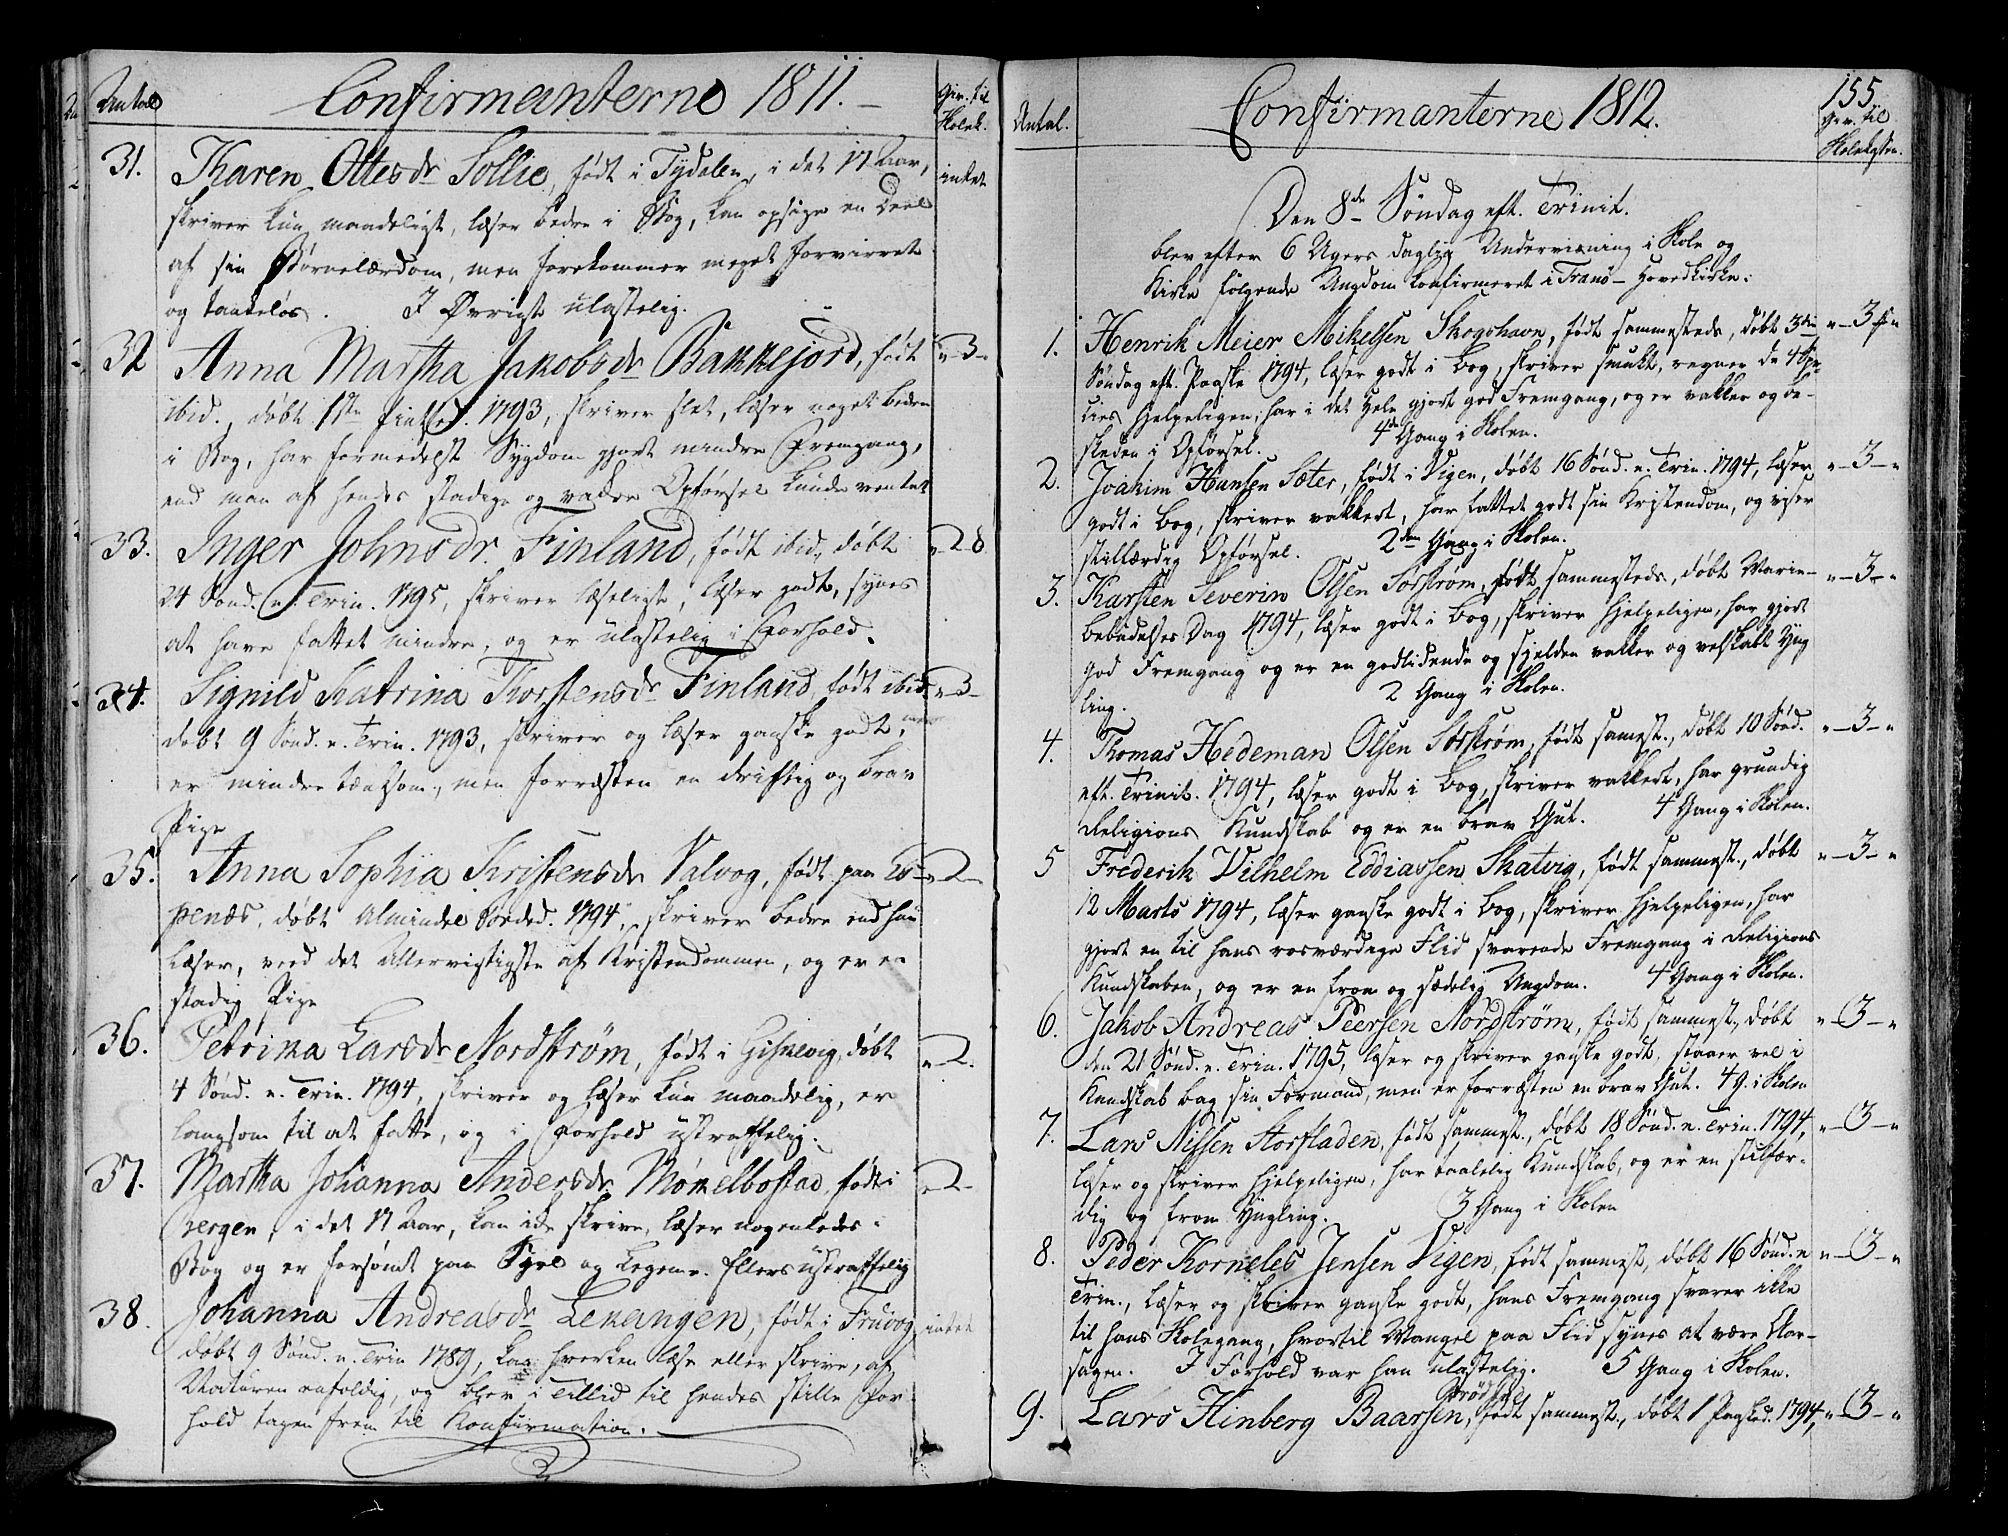 SATØ, Tranøy sokneprestkontor, I/Ia/Iaa/L0003kirke: Ministerialbok nr. 3, 1807-1820, s. 155